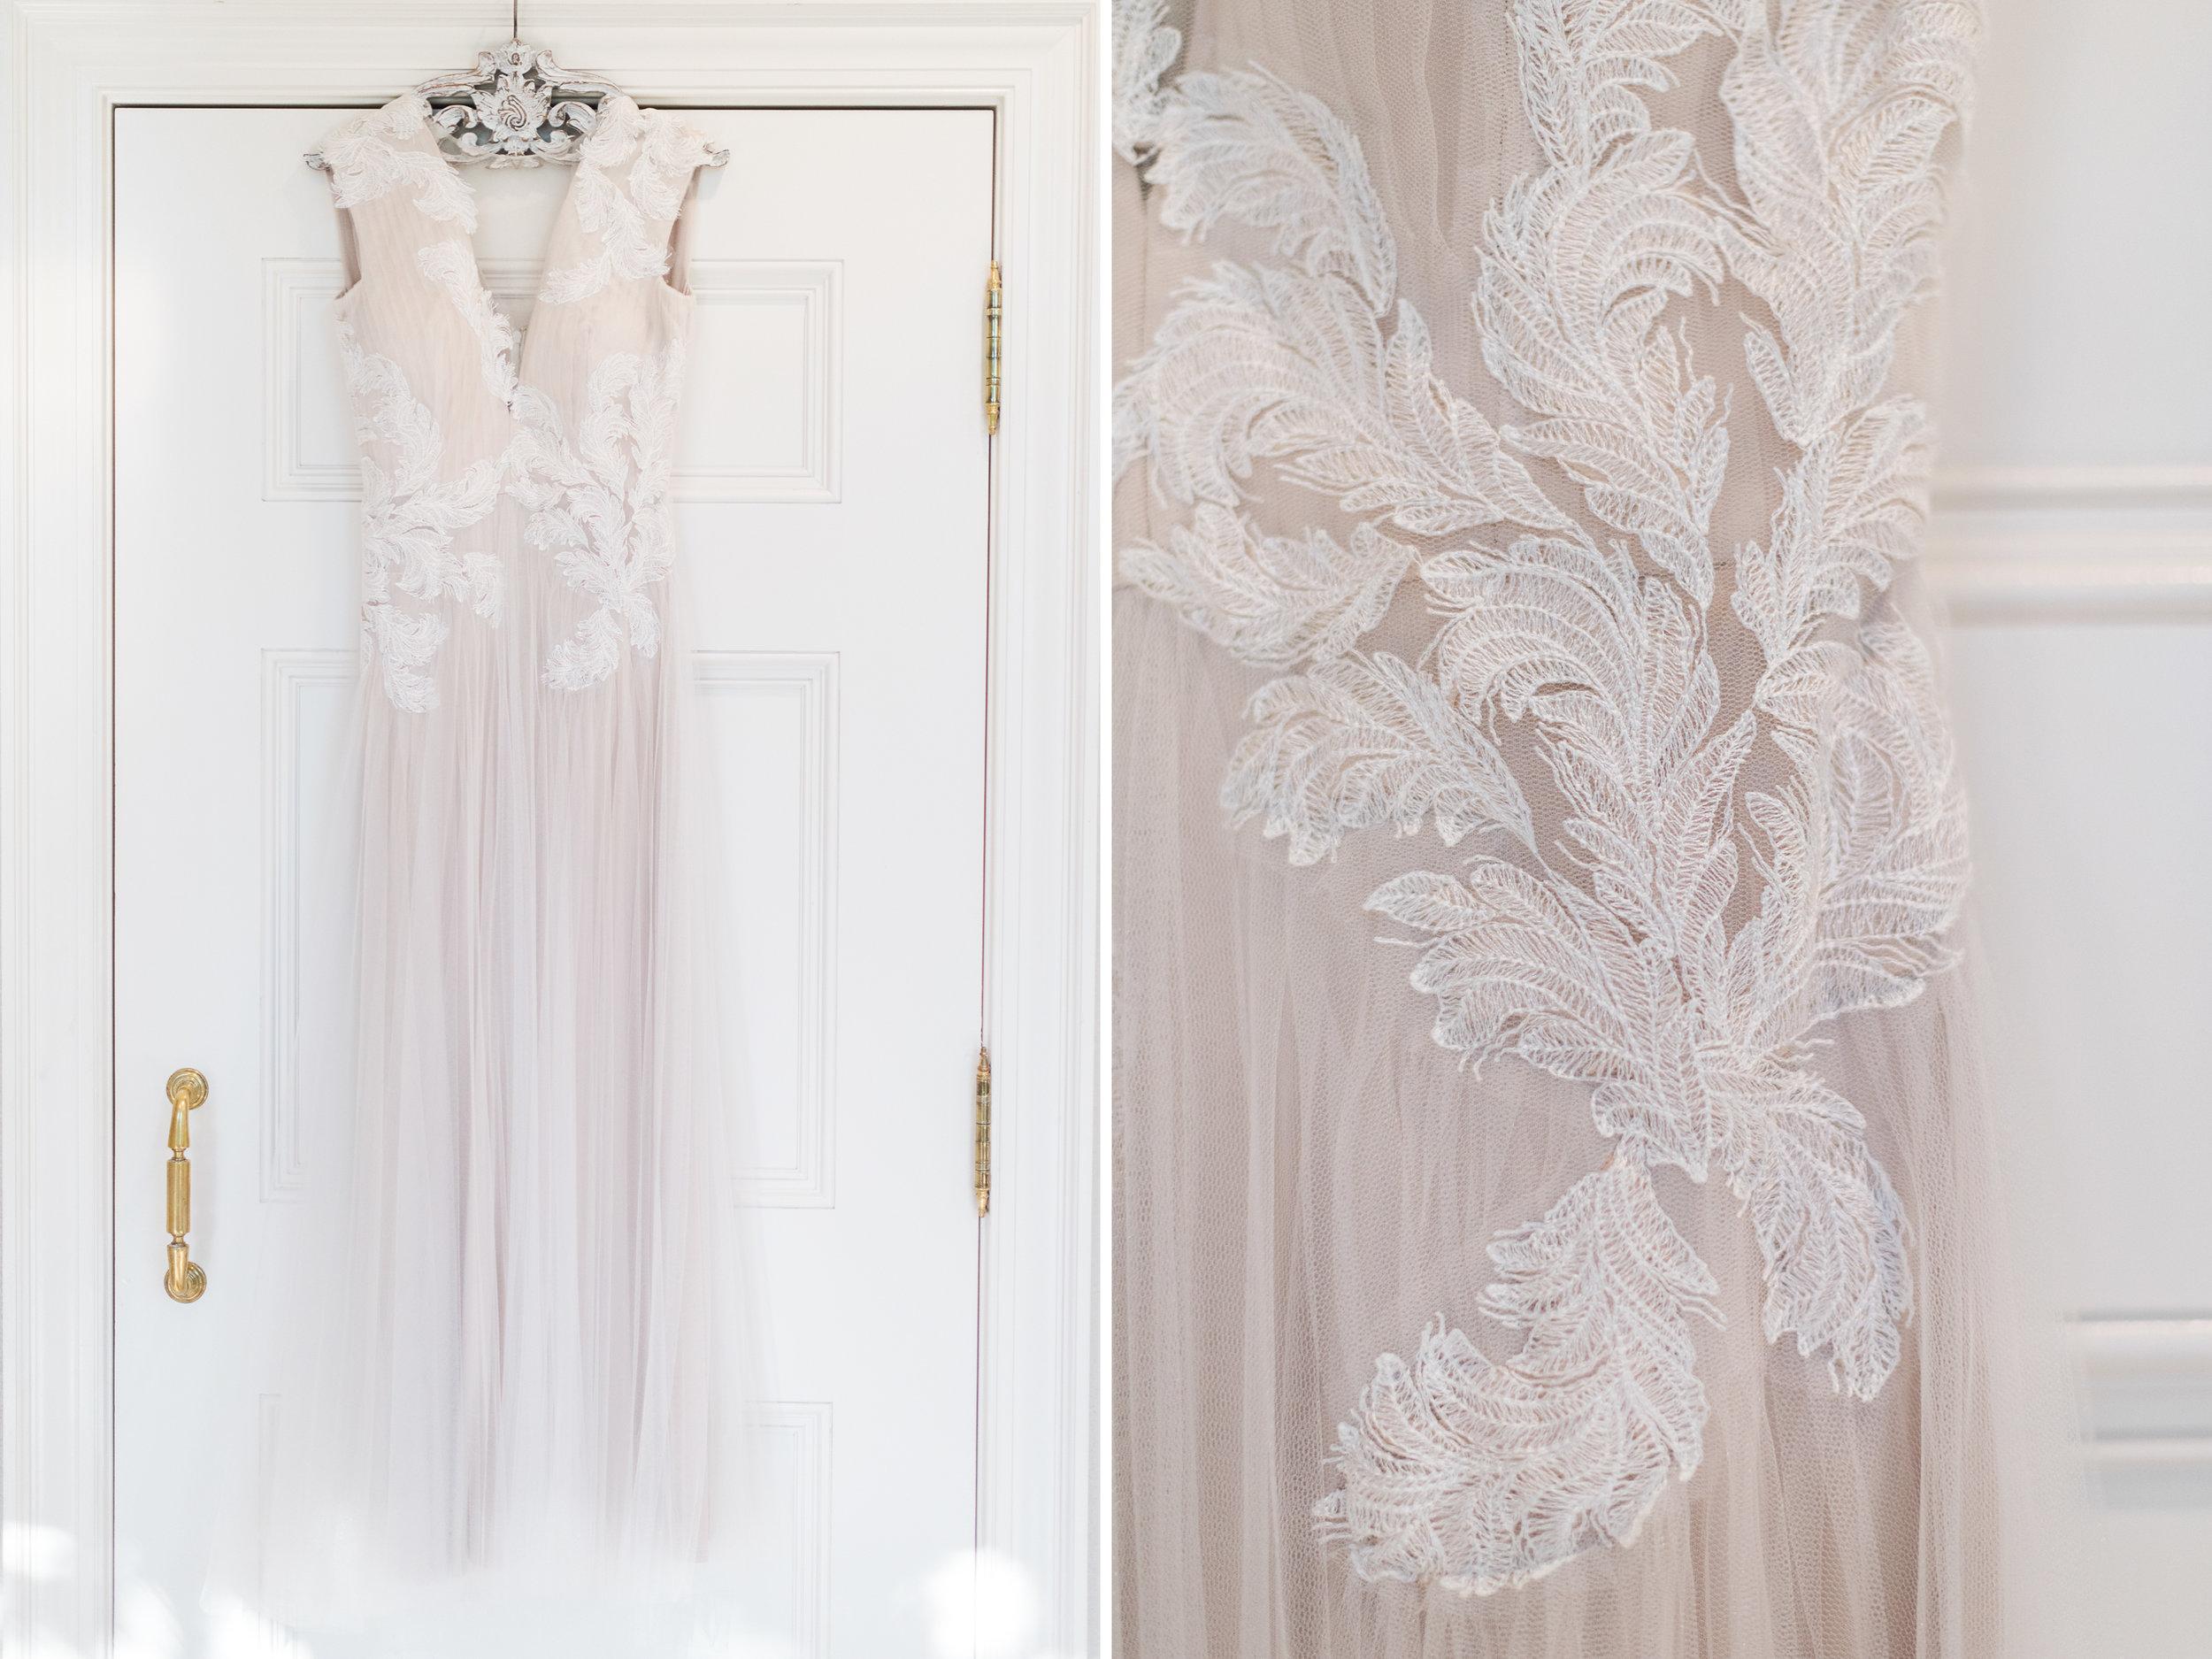 Houston-Wedding-Photographer-Lakeside-Country-Club-First-Look-Bride-Groom-Formals-Film-Fine-Art-Photography-101.jpg